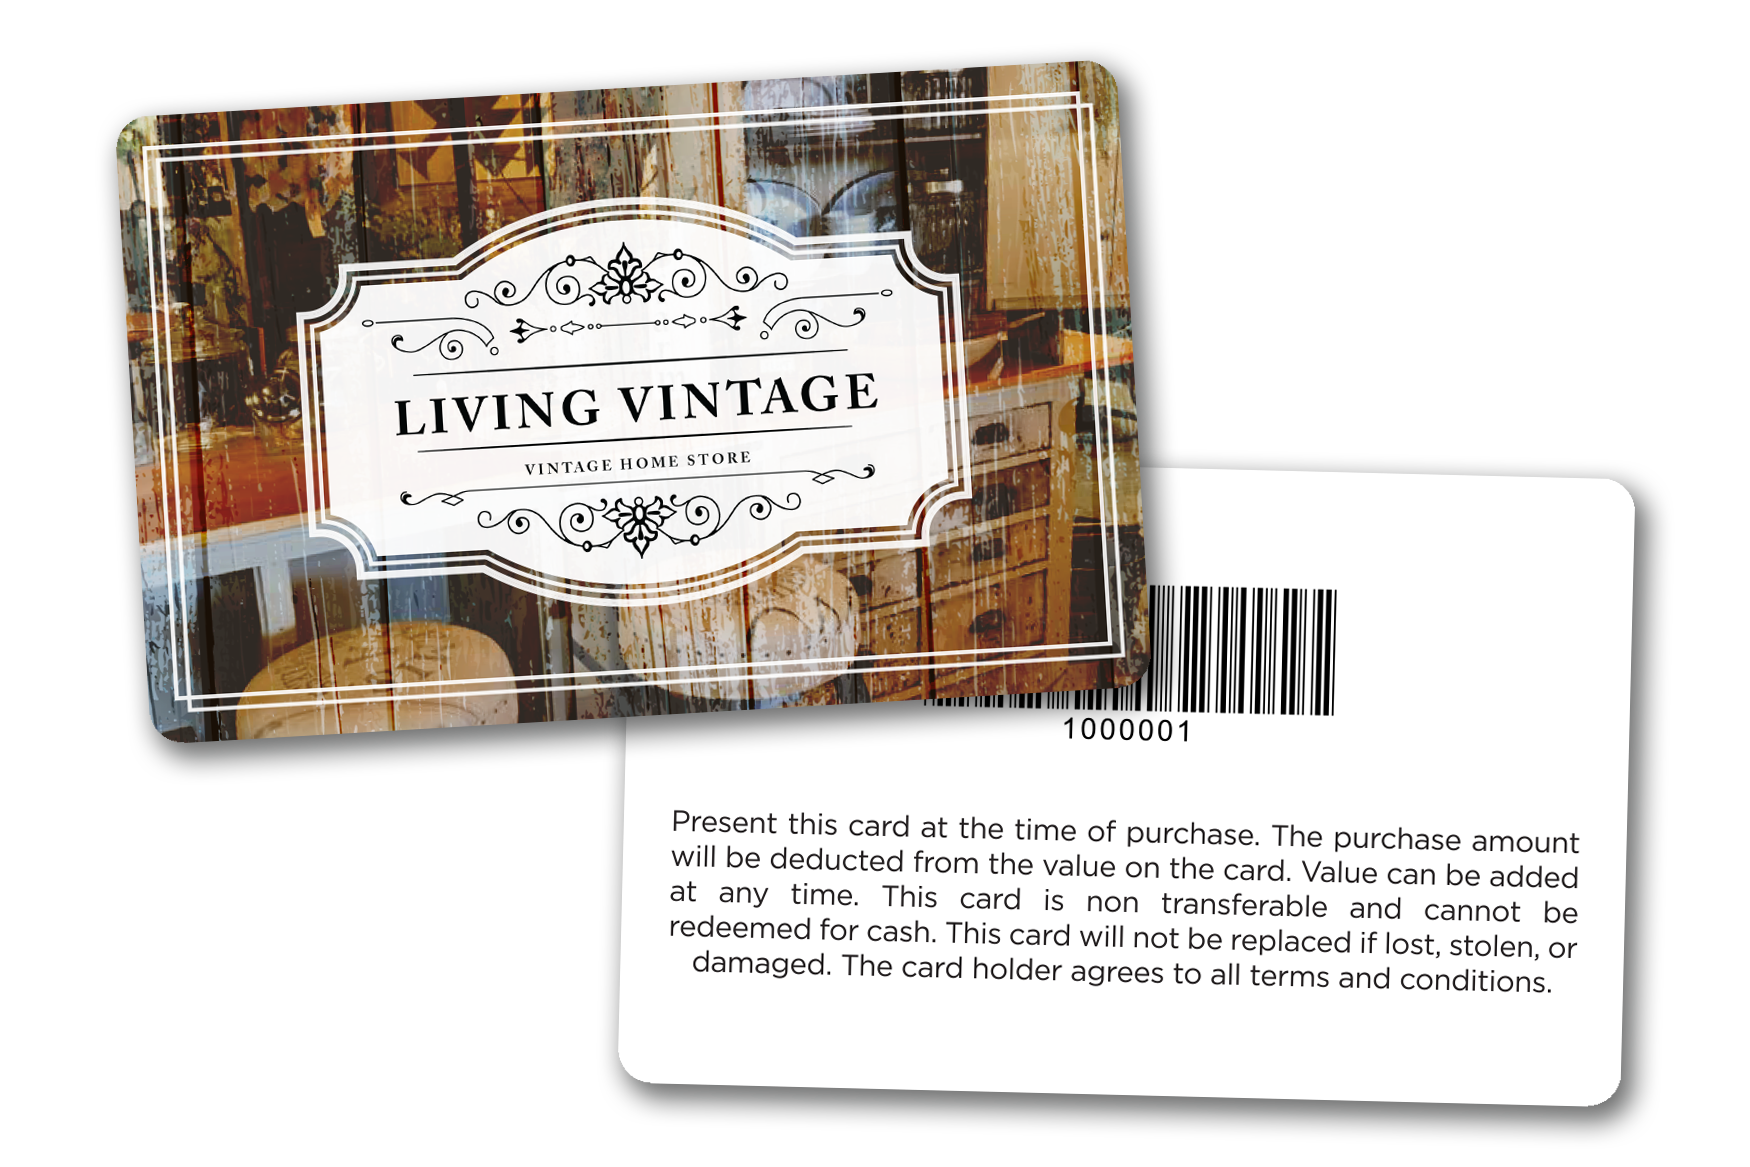 Custom Gift Cards for Living Vintage - A Vintage Home Store